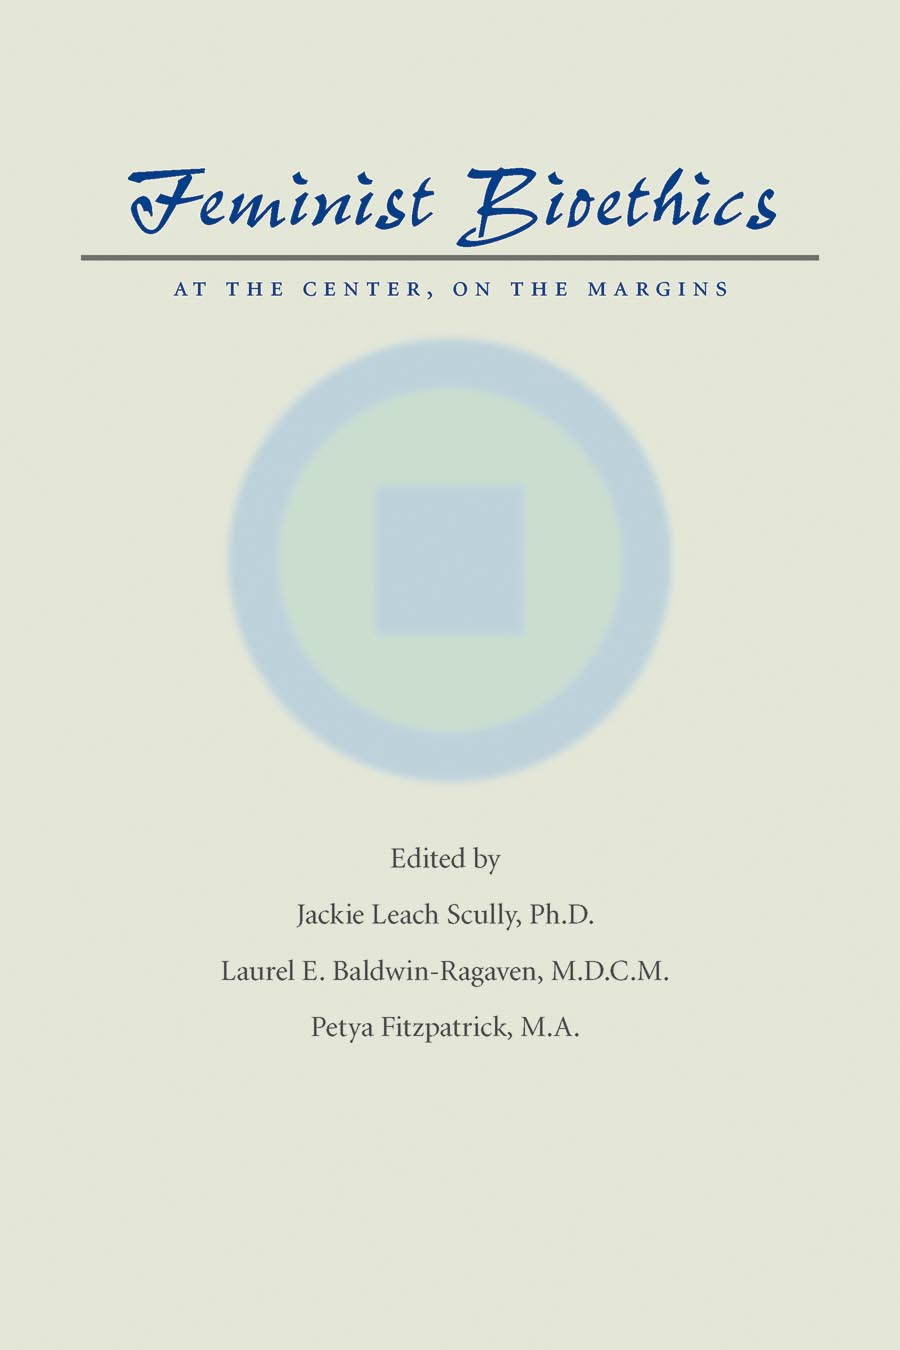 Feminist Bioethics – At the Center, on the Margins benjamin m o odhoji restorying the margins